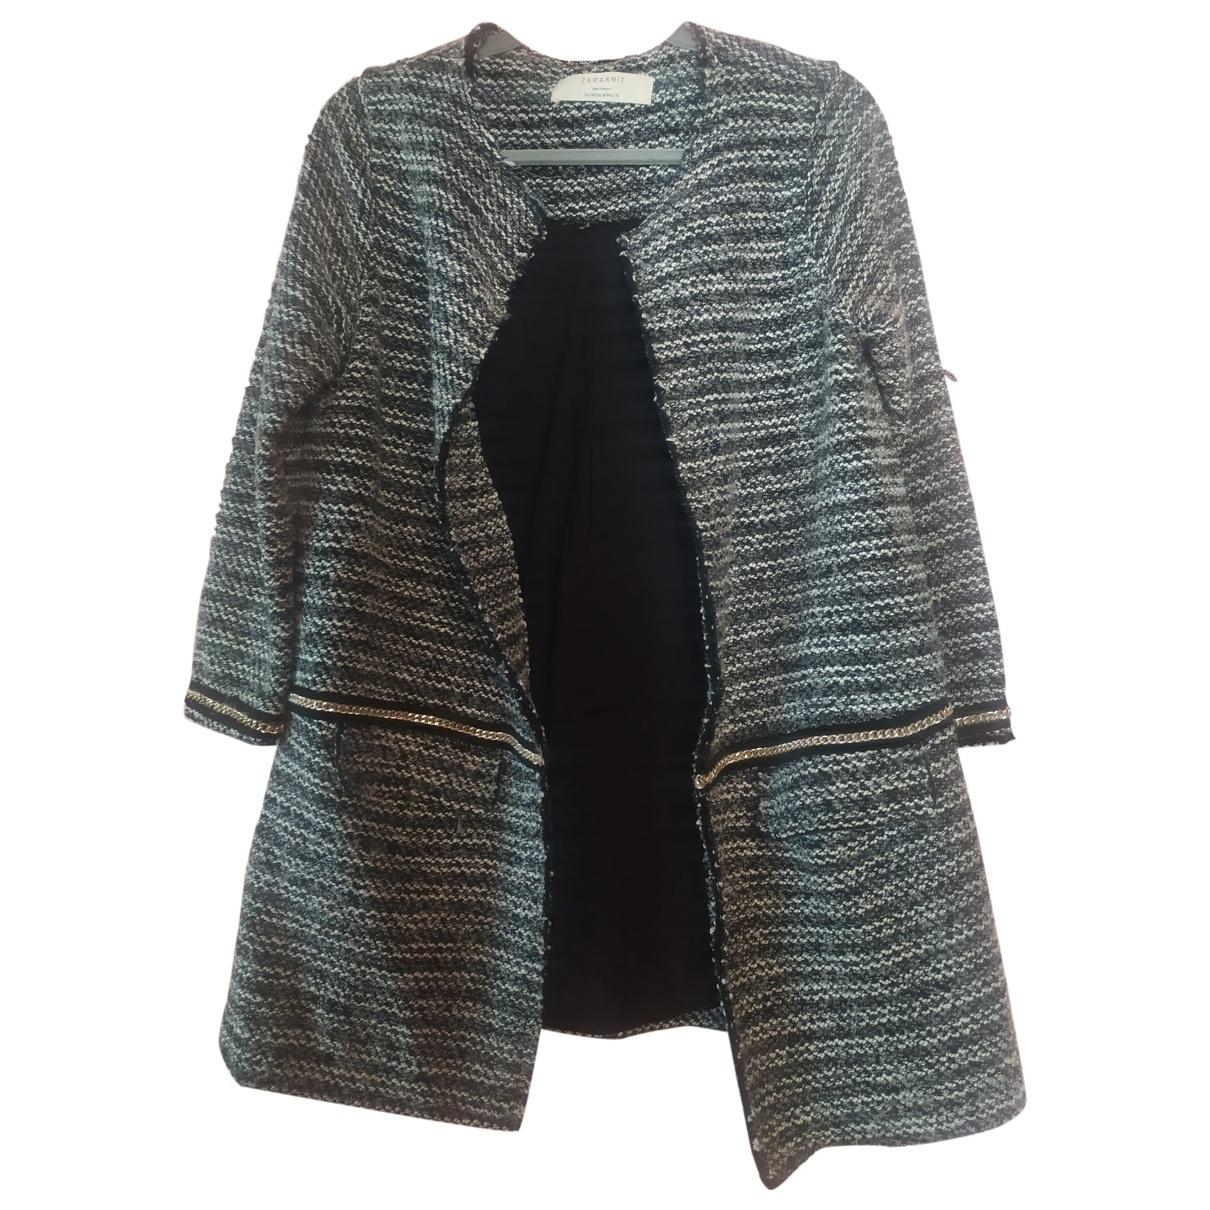 Zara \N Anthracite Wool coat for Women 40 FR